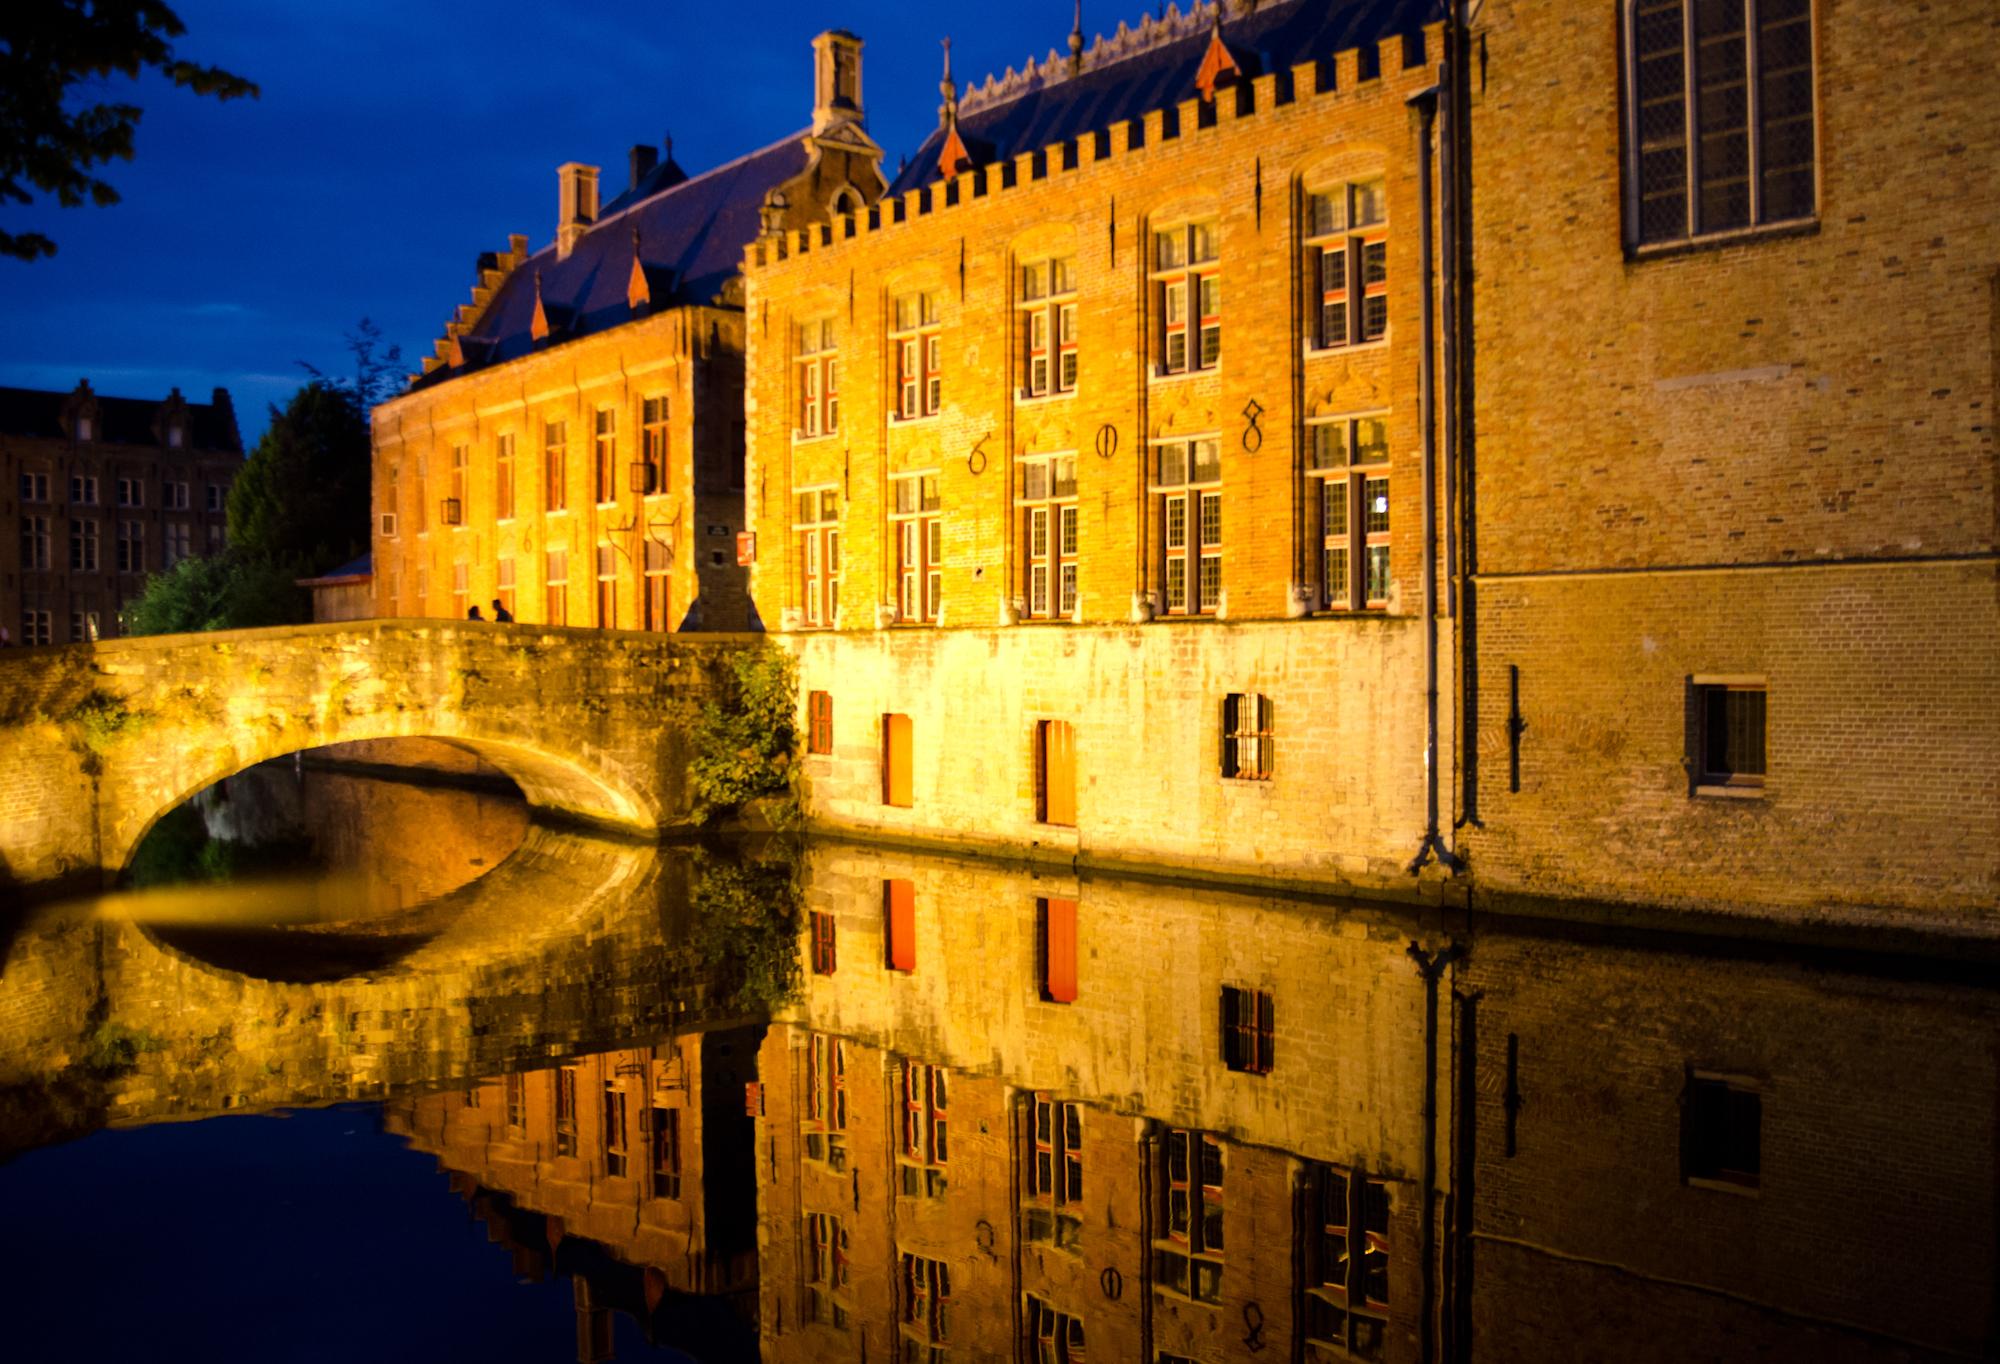 2012-08-13 67 Brugge